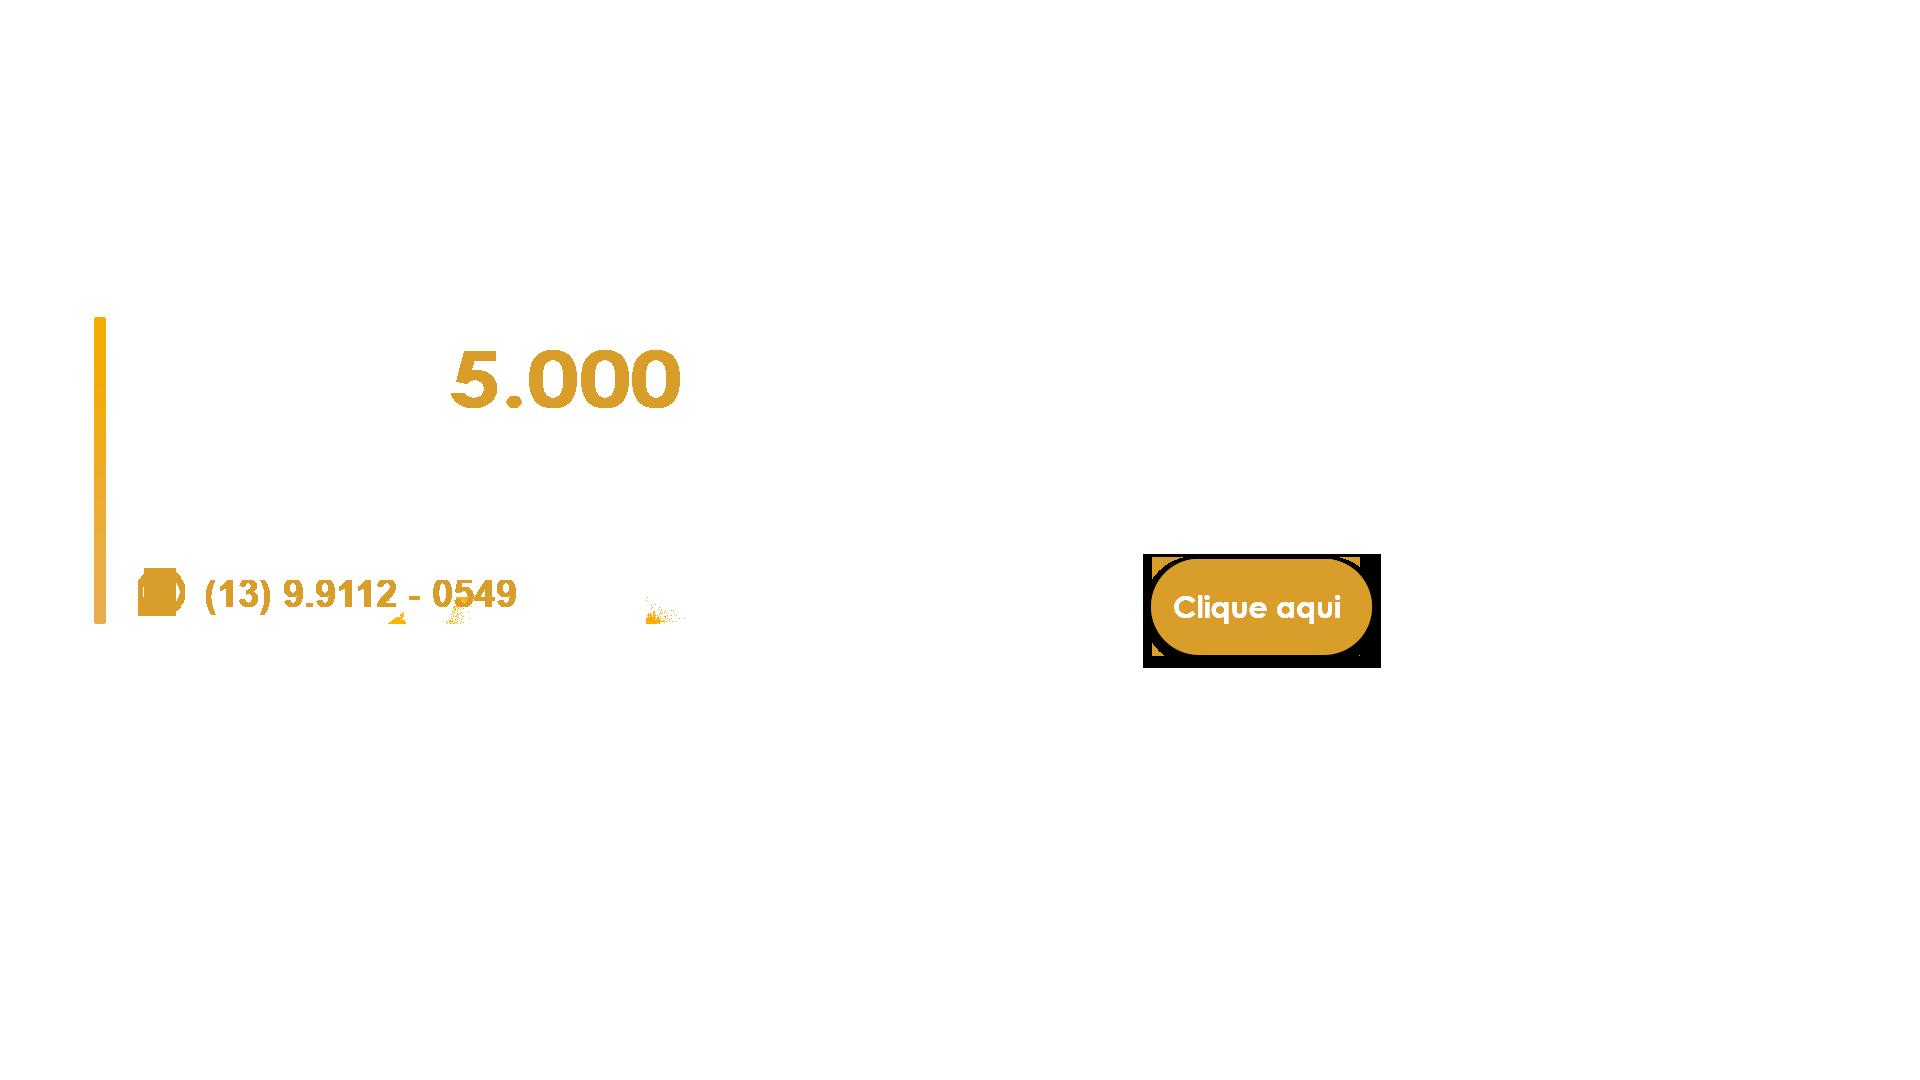 Compre pelo whatsapp